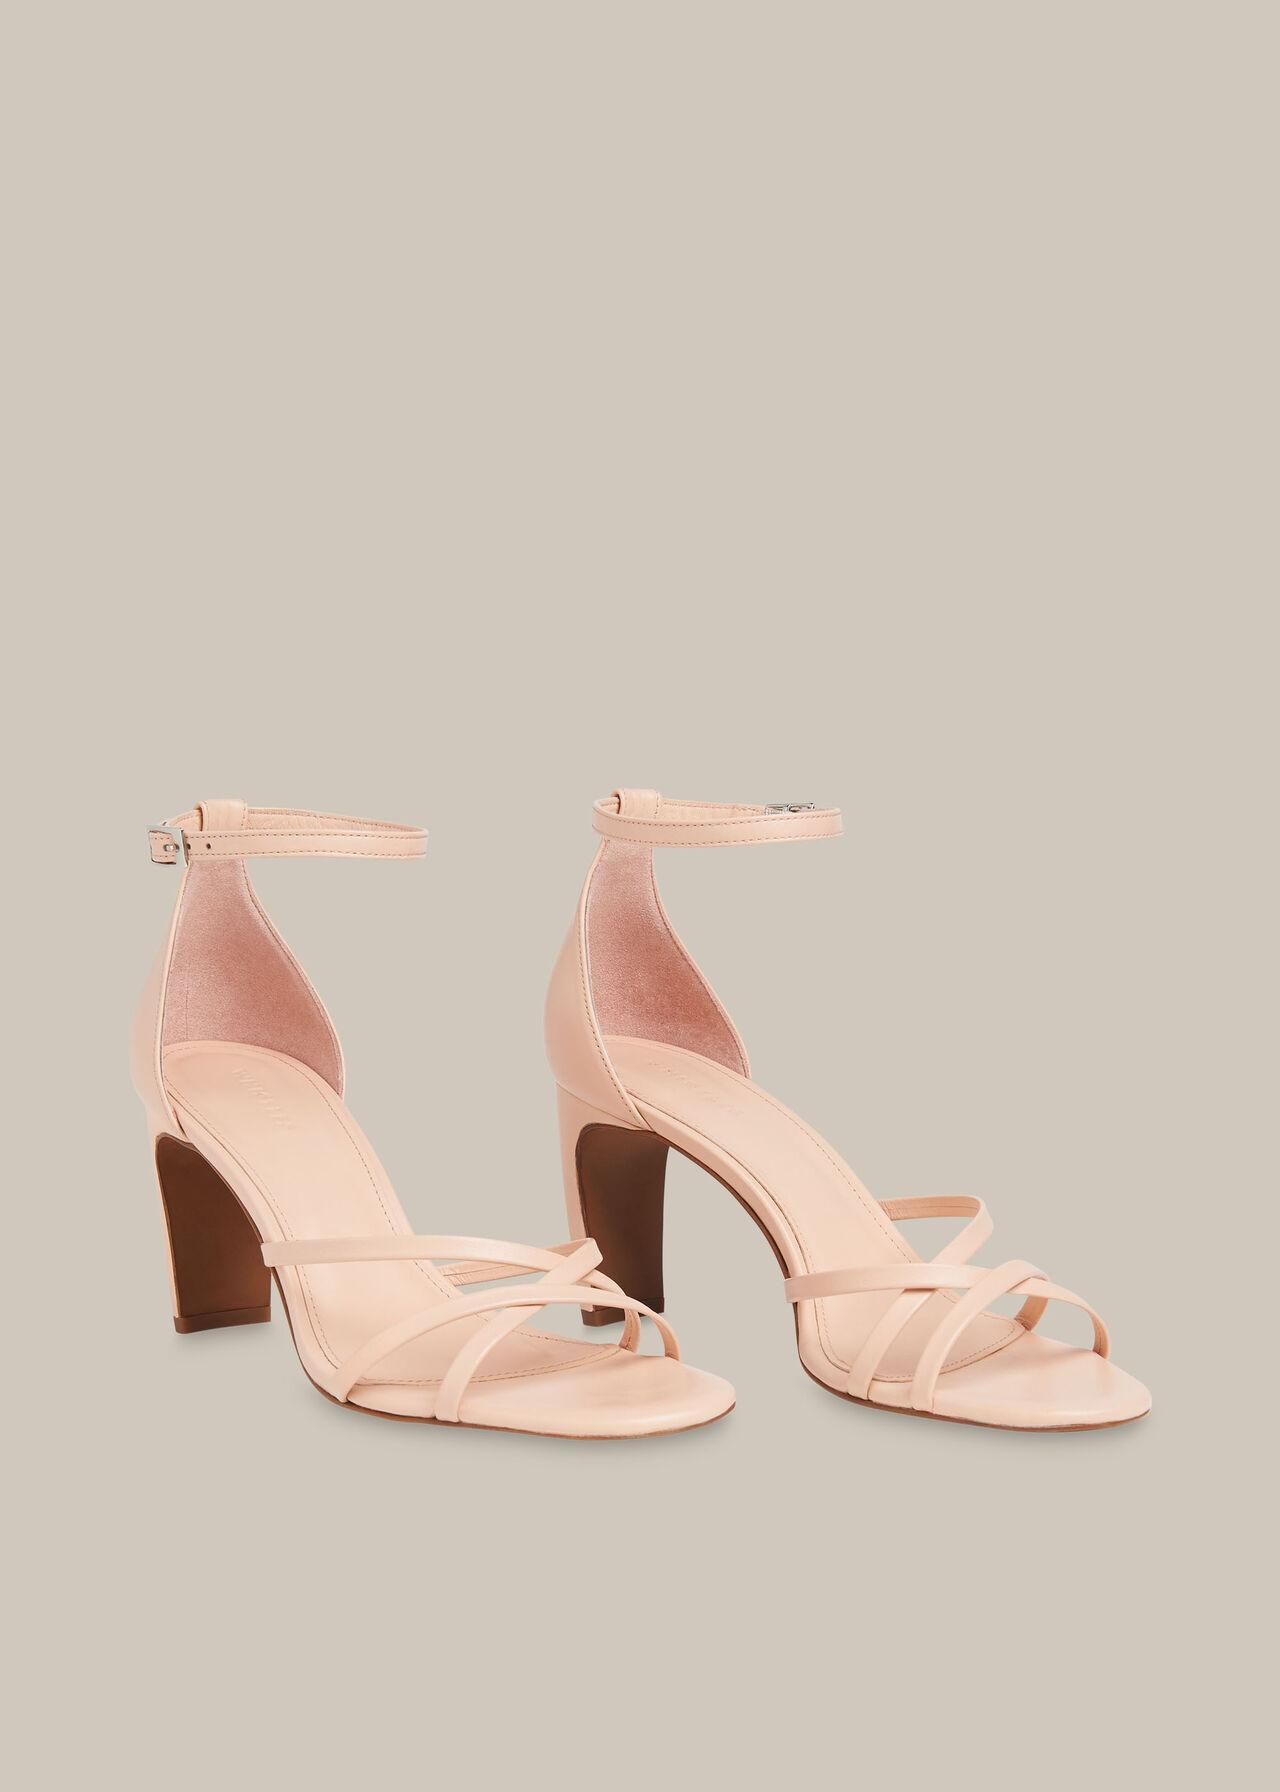 Hallie Strappy High Sandal Pale Pink